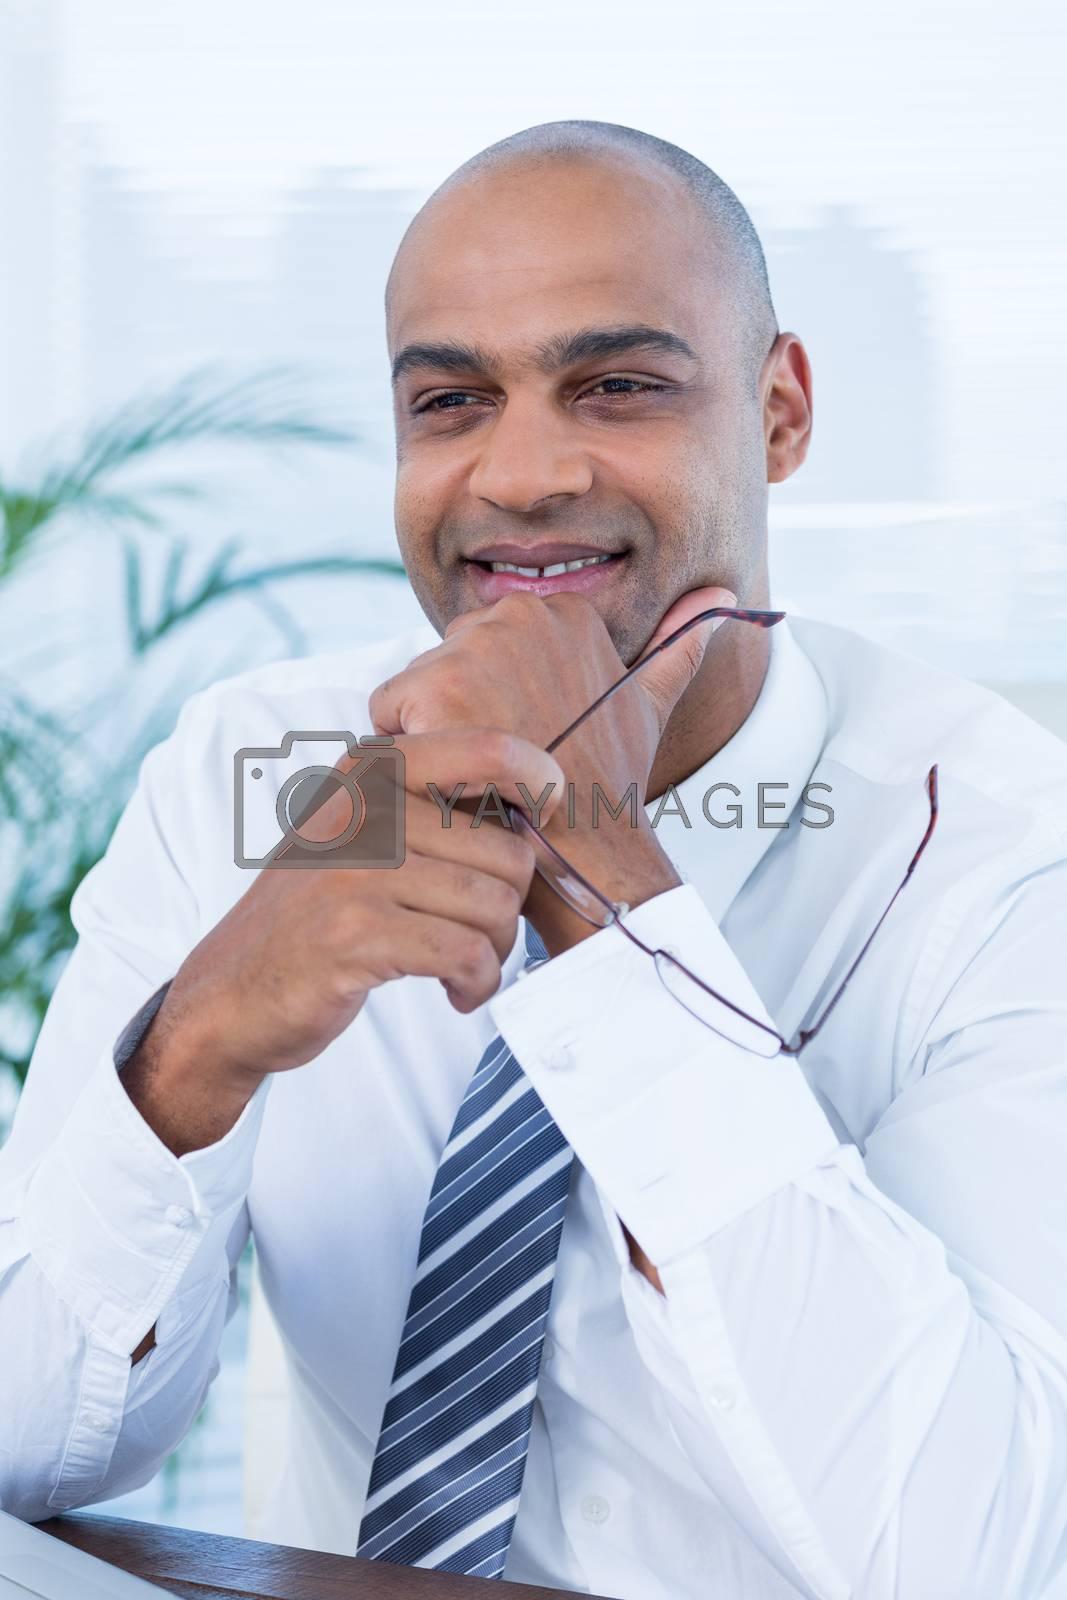 Royalty free image of Smiling businessman holding reading glasses by Wavebreakmedia